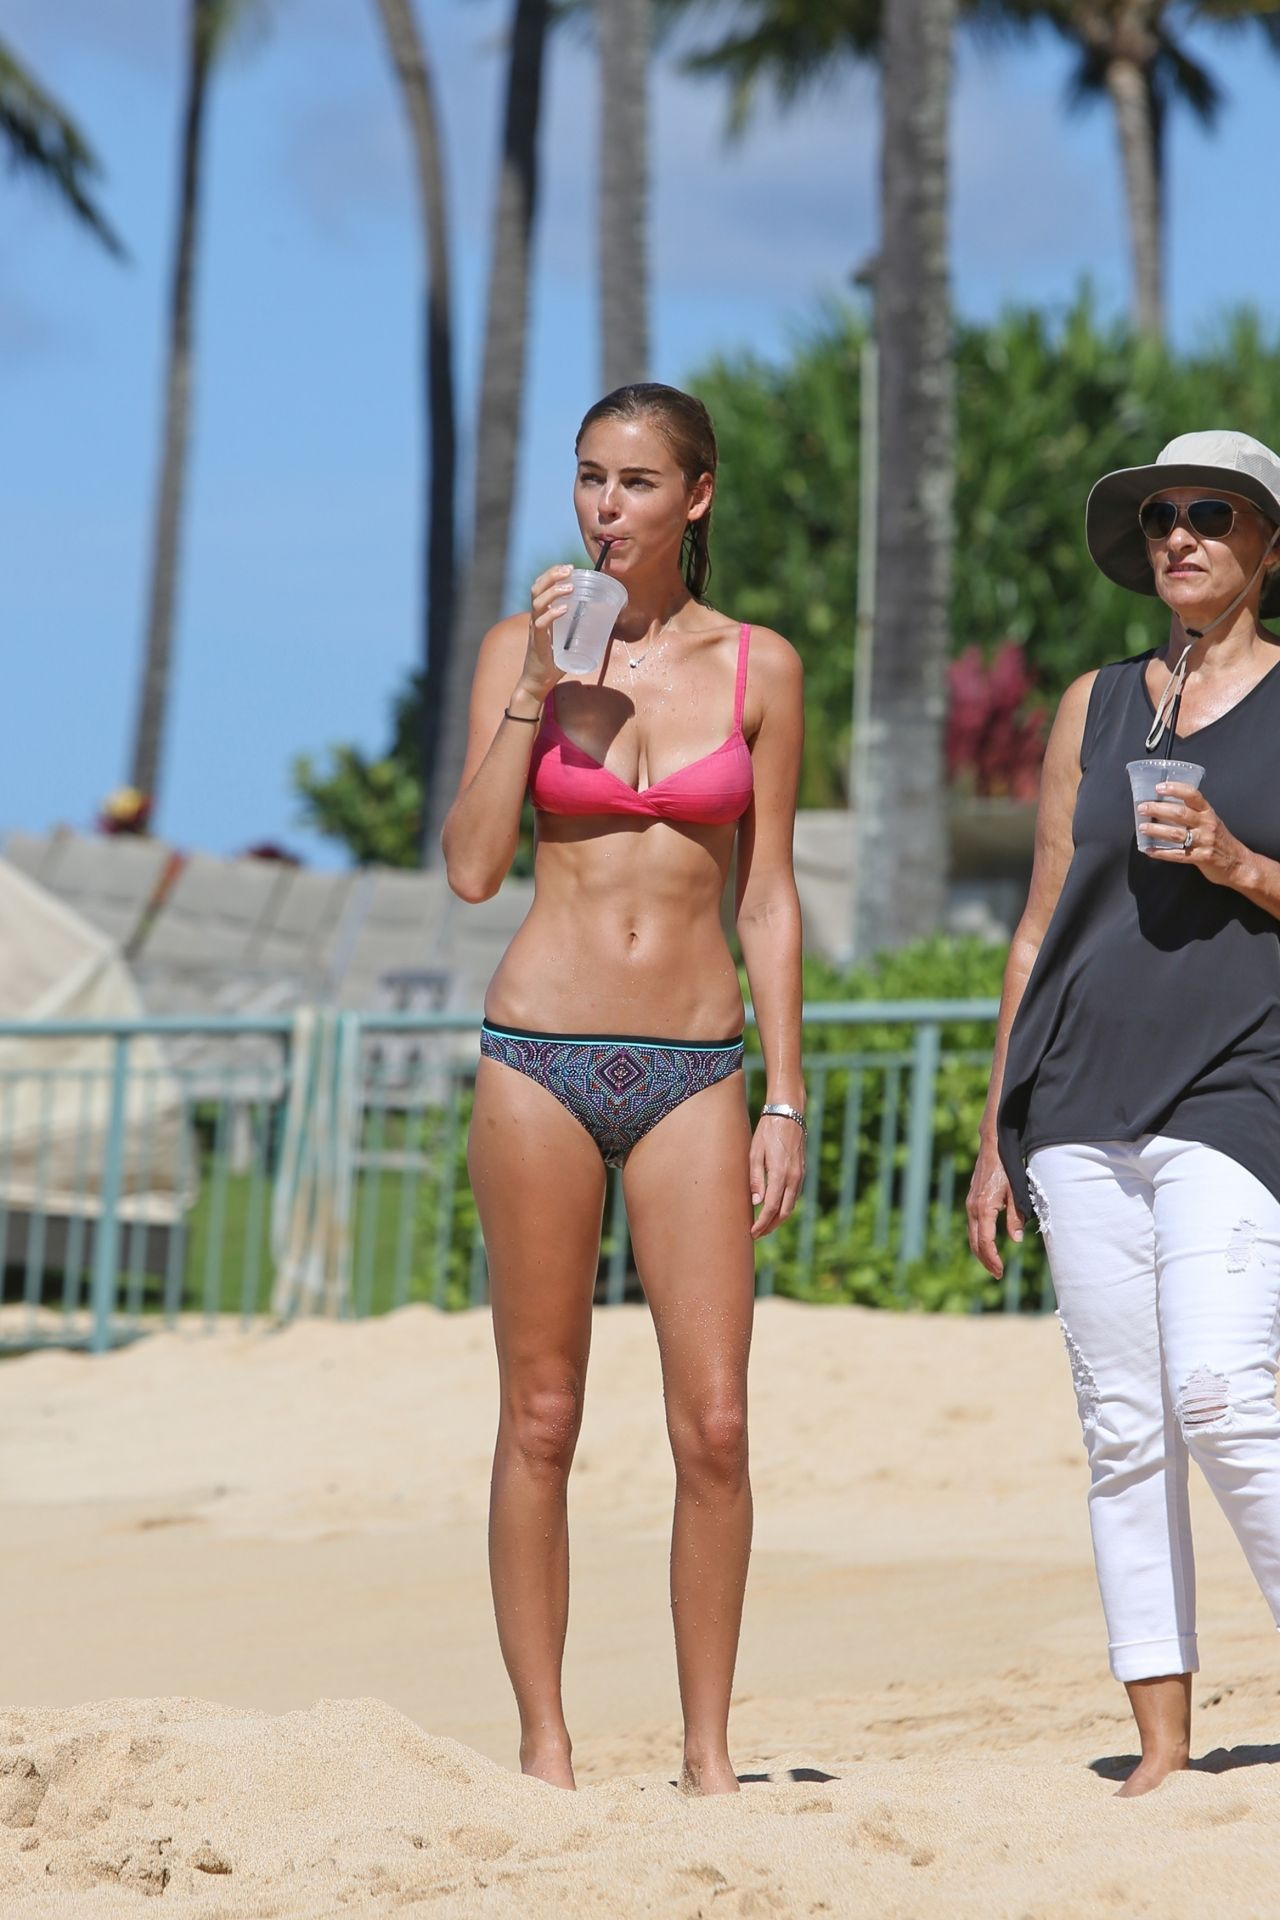 Elizabeth Turner Showed Off Her Slim Physique in Bikini on the Beach in Hawaii 09/10/2017